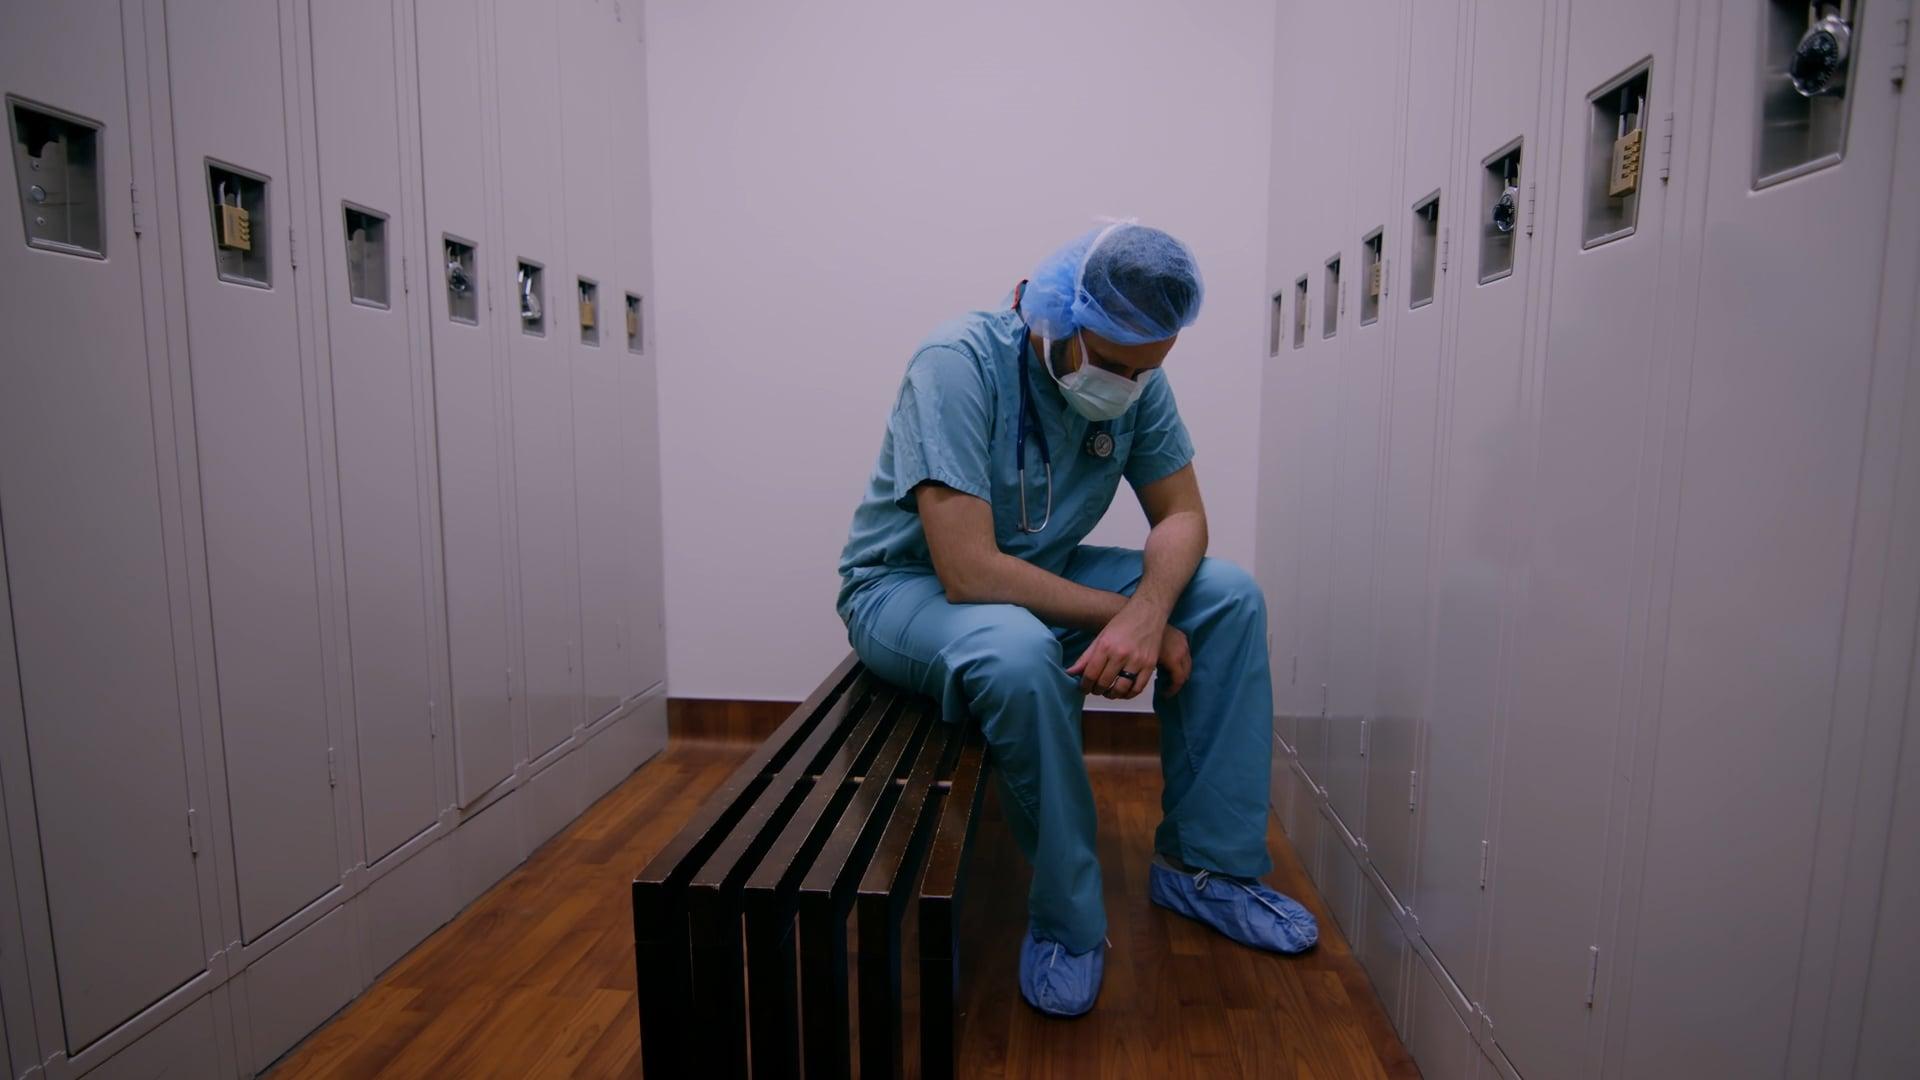 Utah HERO Project: Healthcare Workers